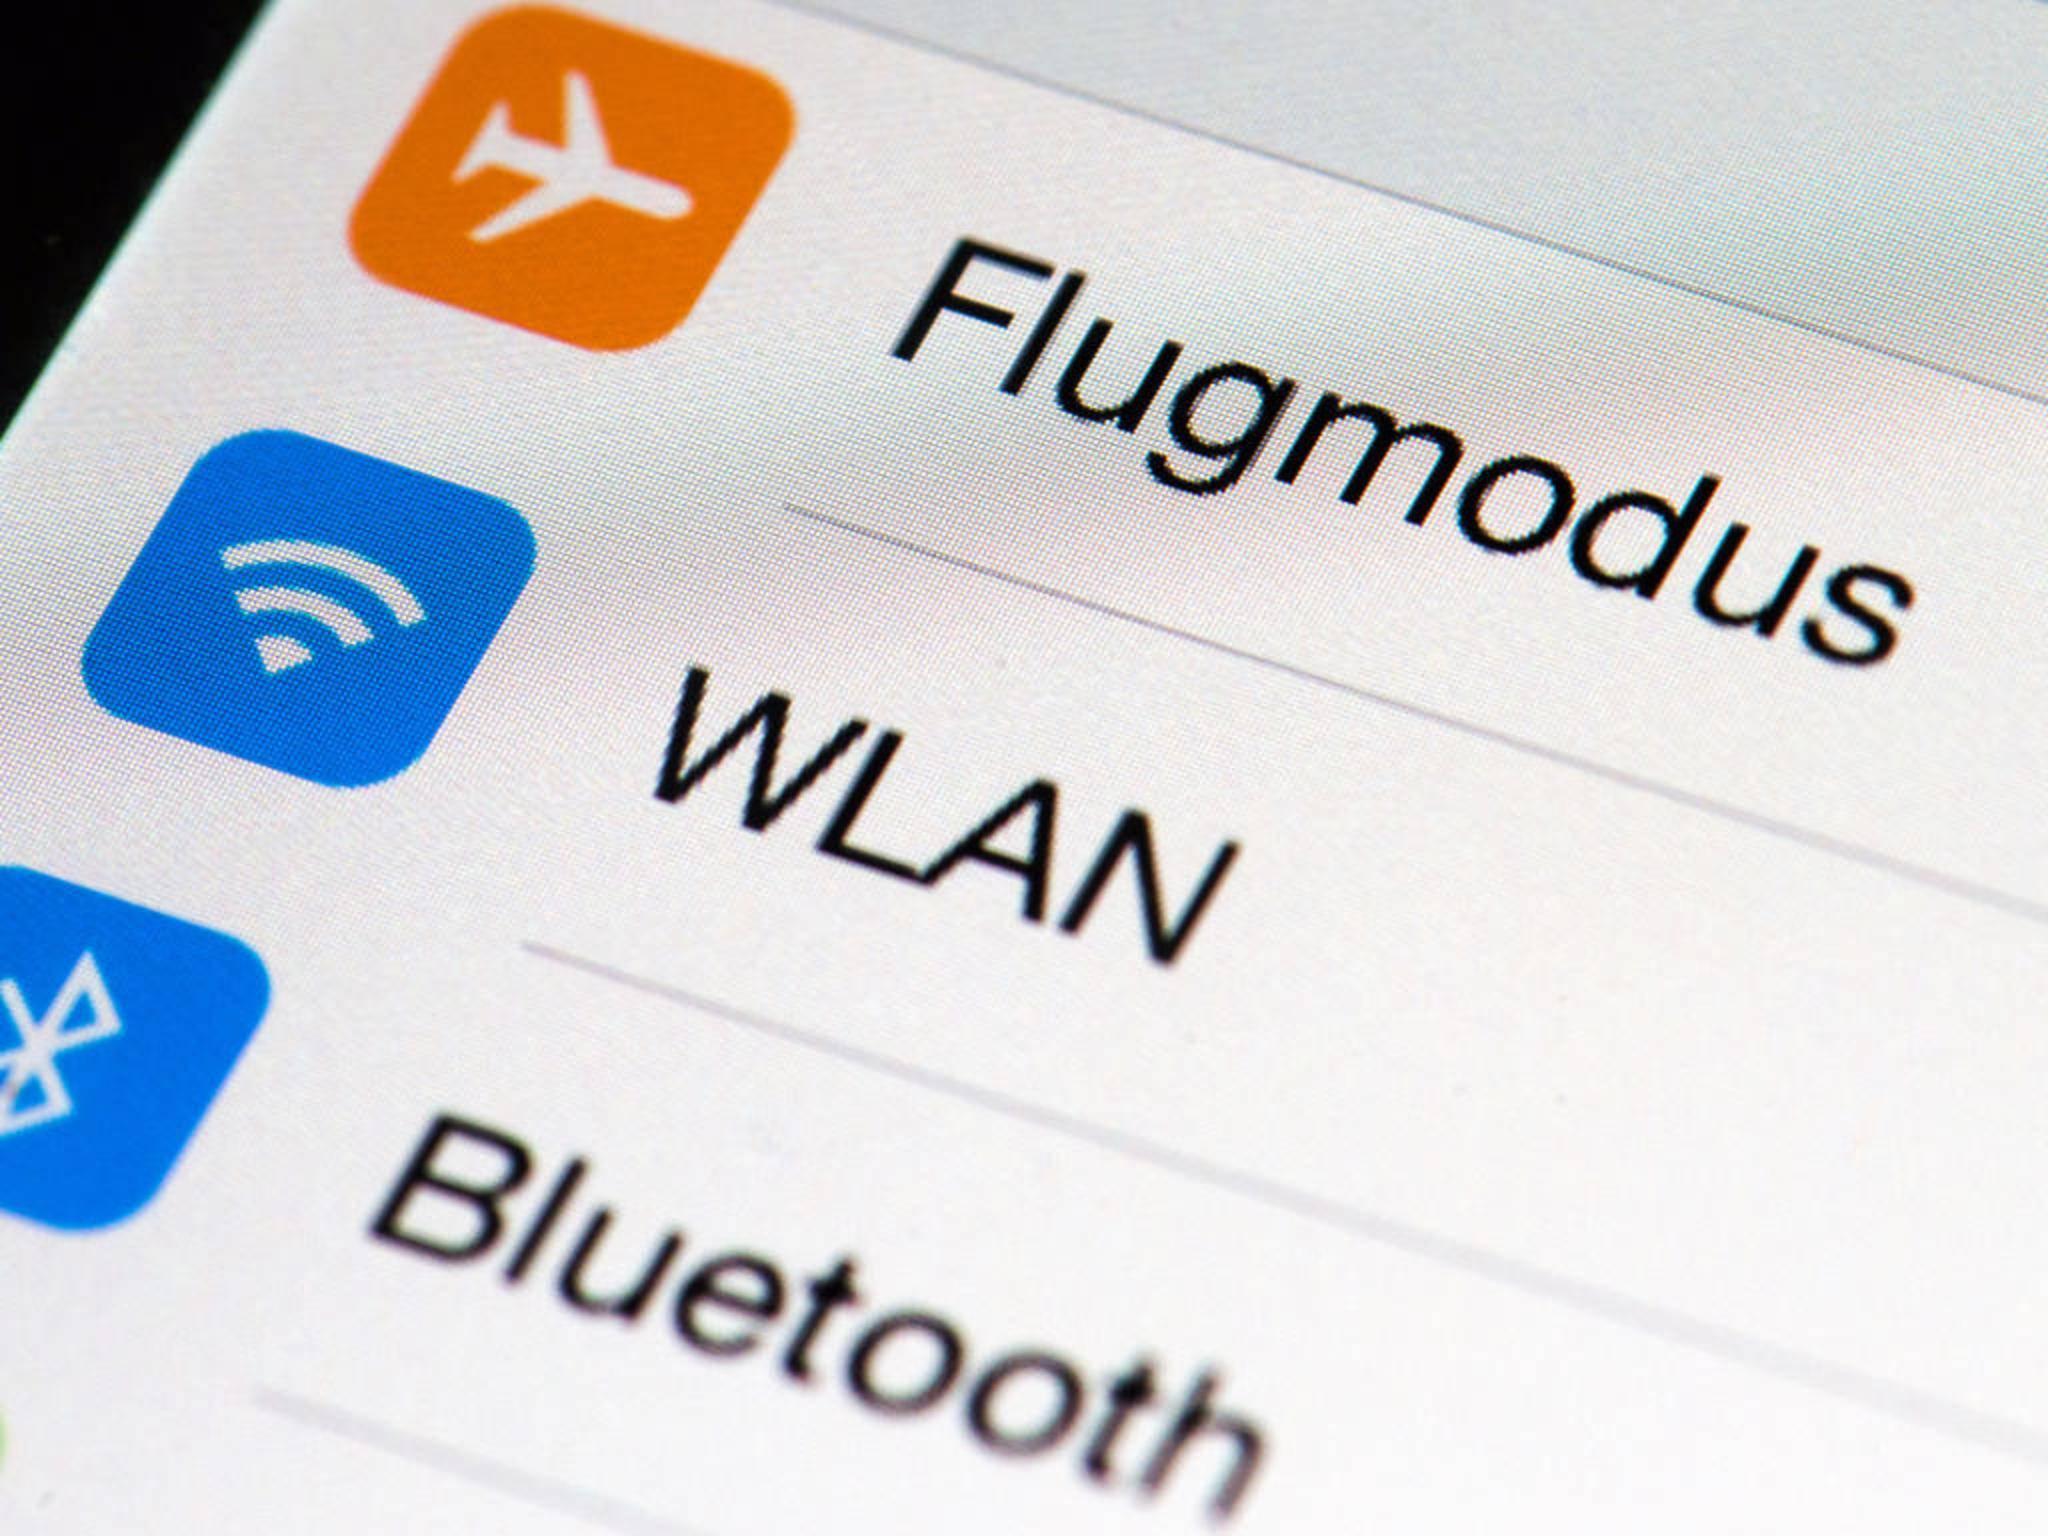 Kann man das WLAN-Passwort im iPhone anzeigen lassen?